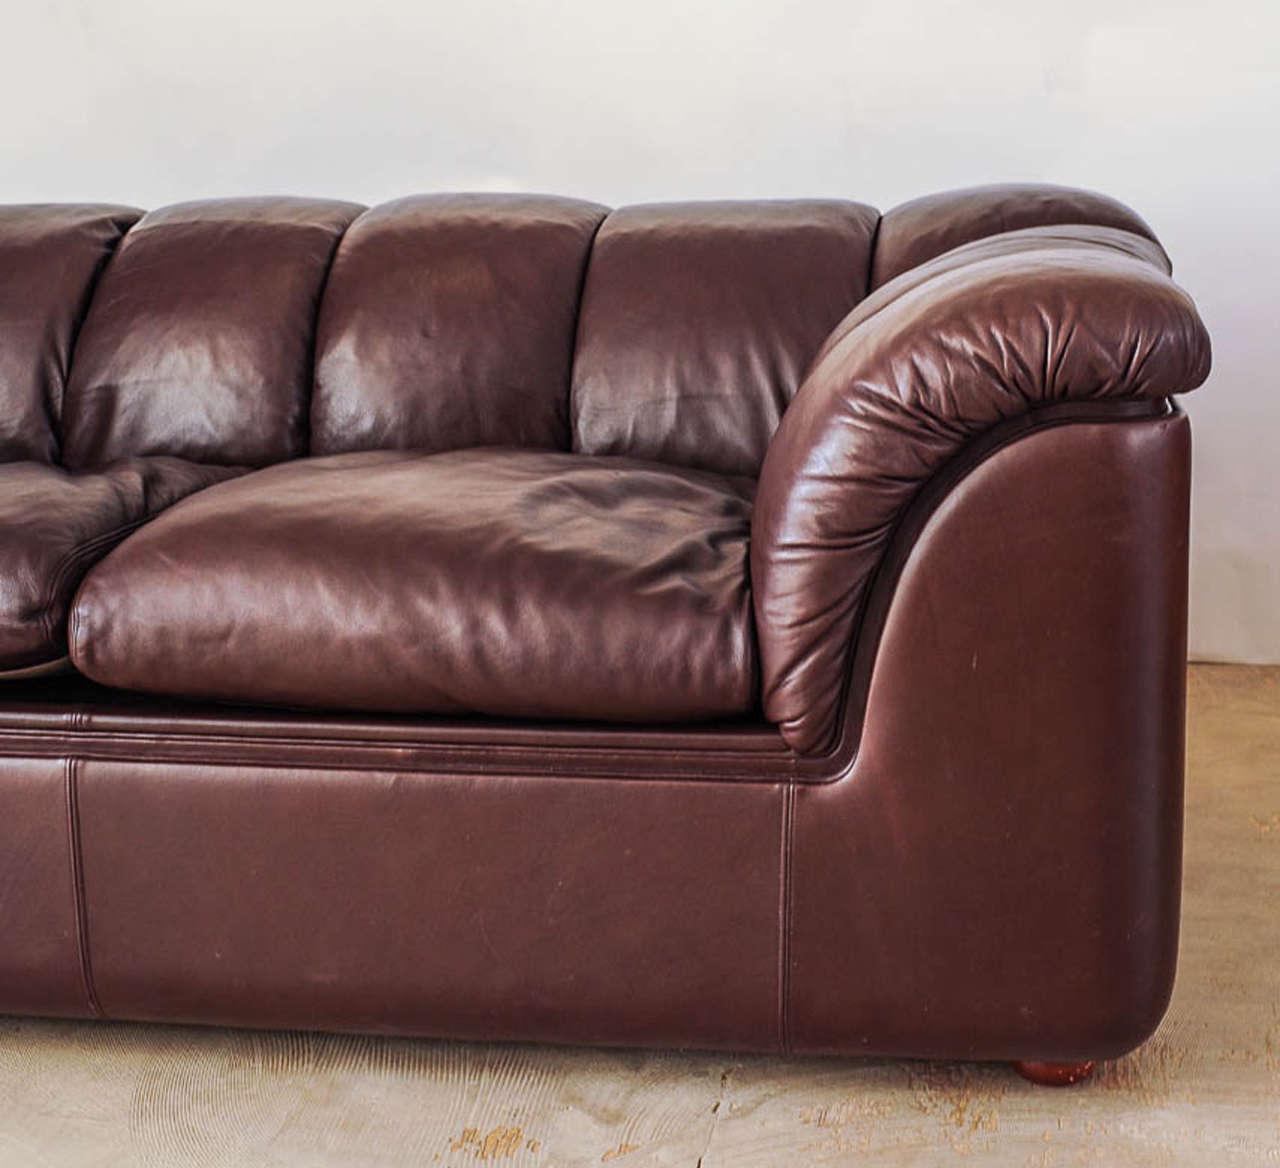 Leather sofa by poltrona frau at 1stdibs - Leather Sofa By Poltrona Frau 3